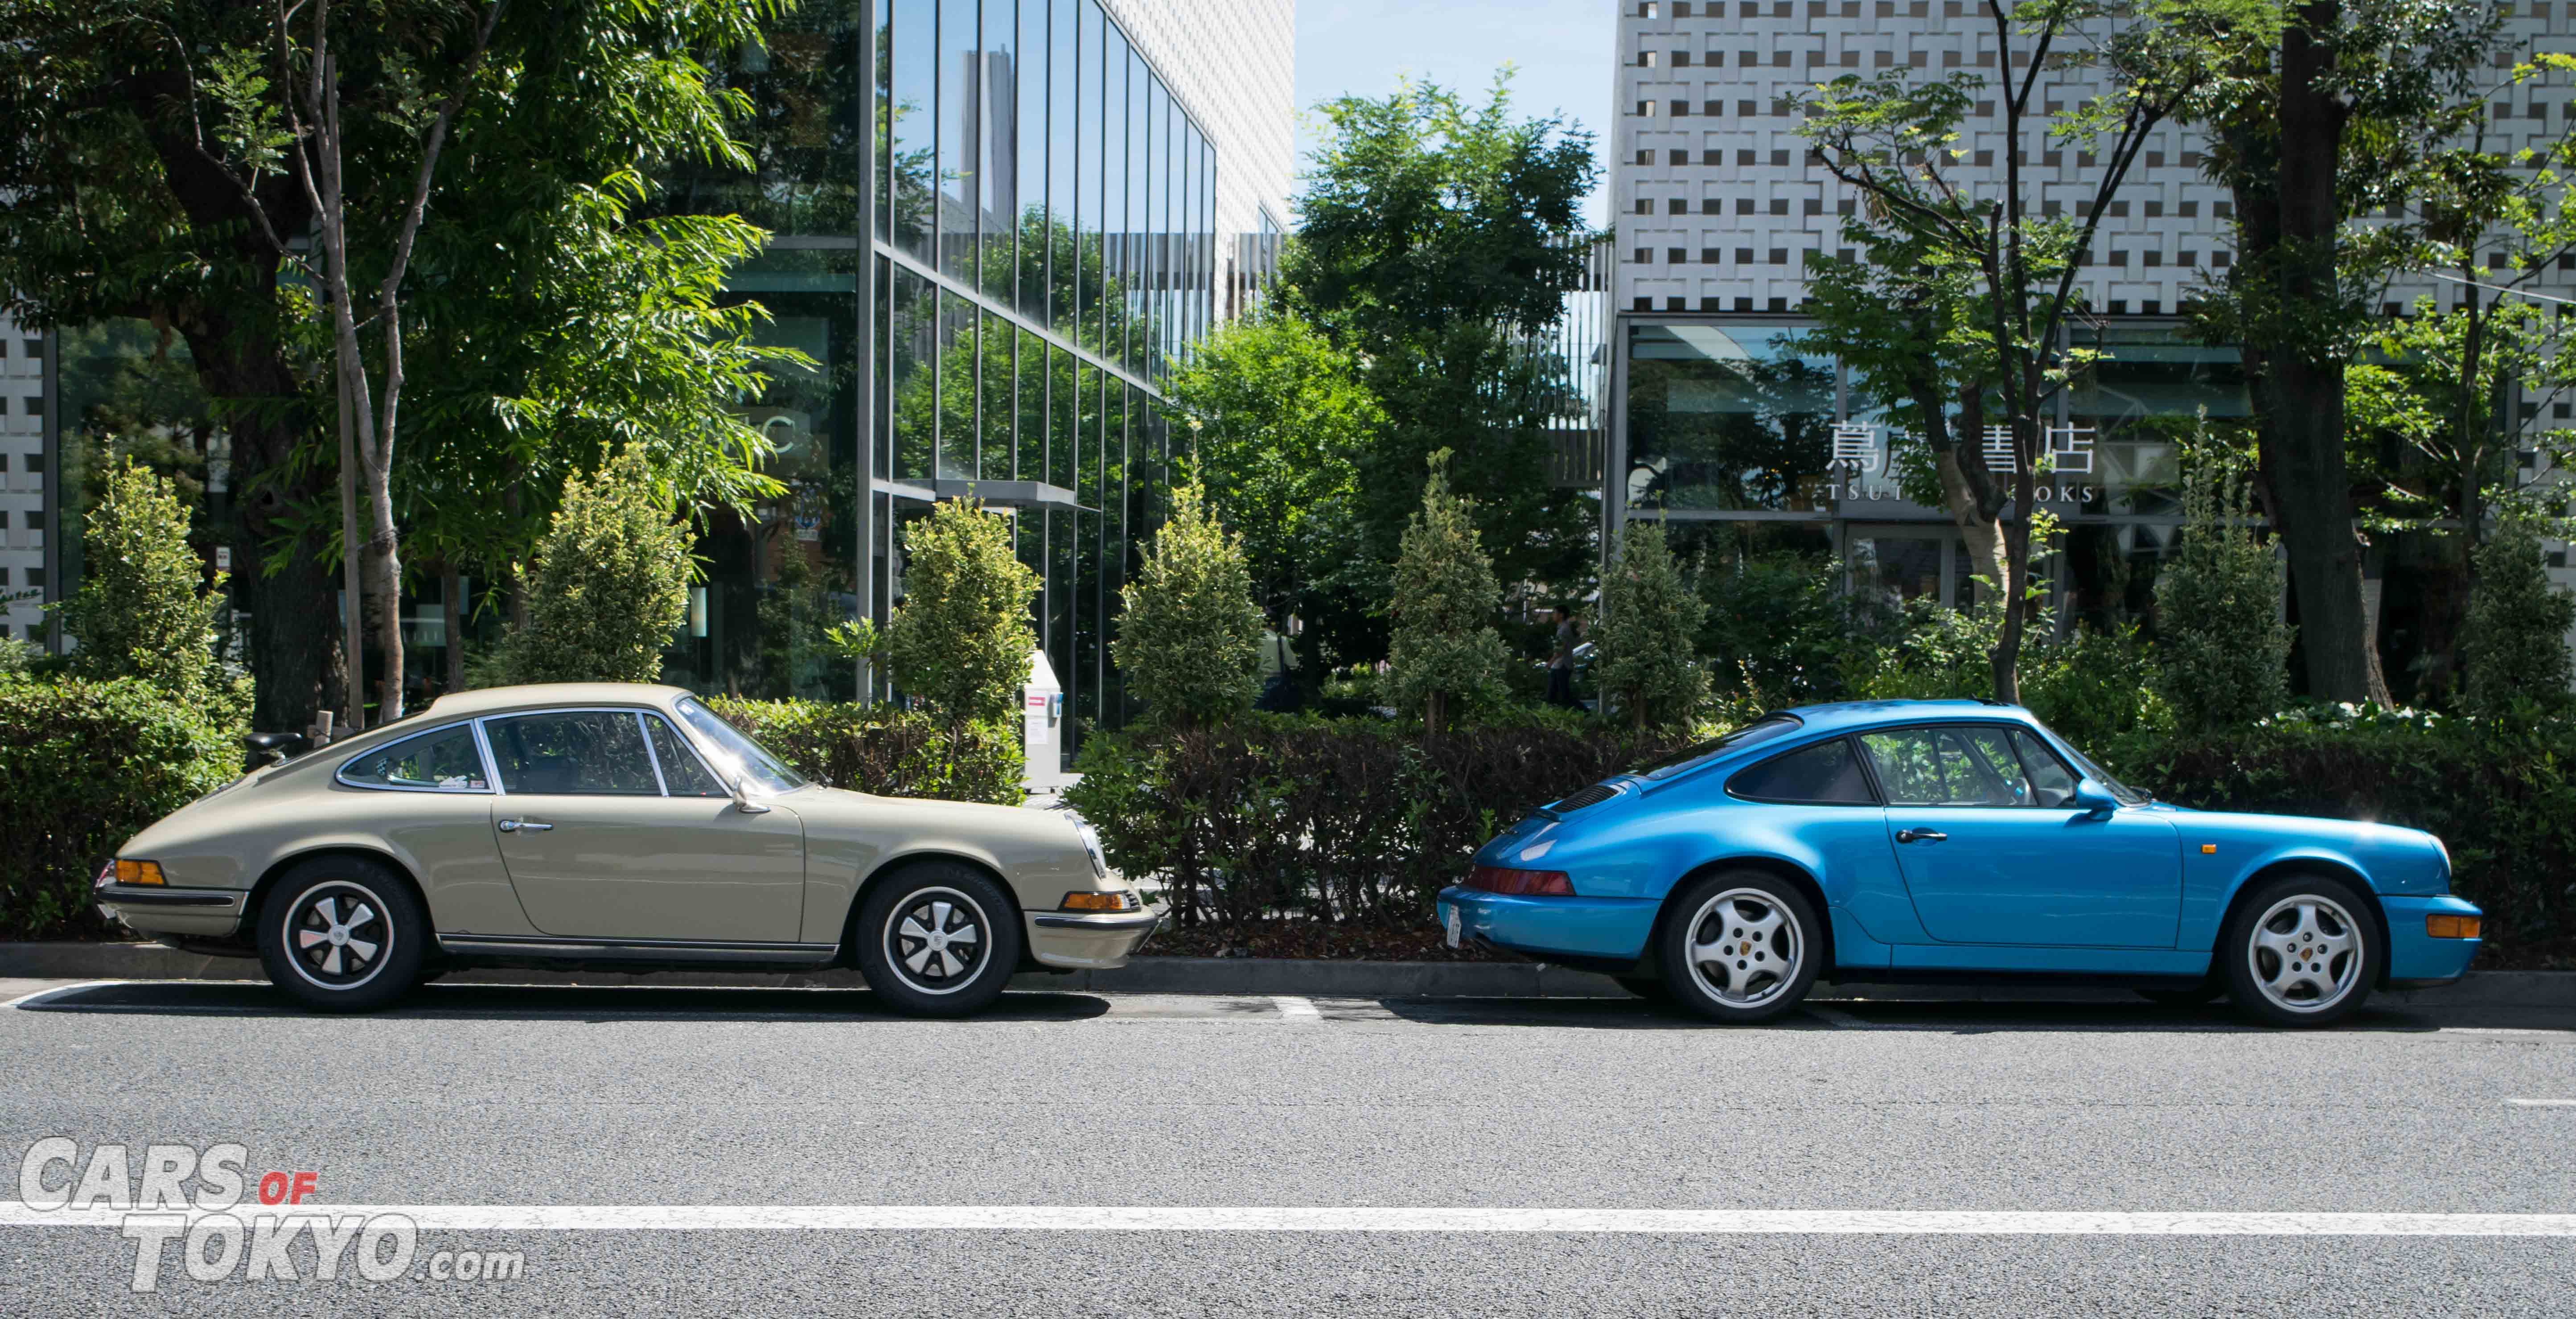 Cars of Tokyo Classic Porsche 911